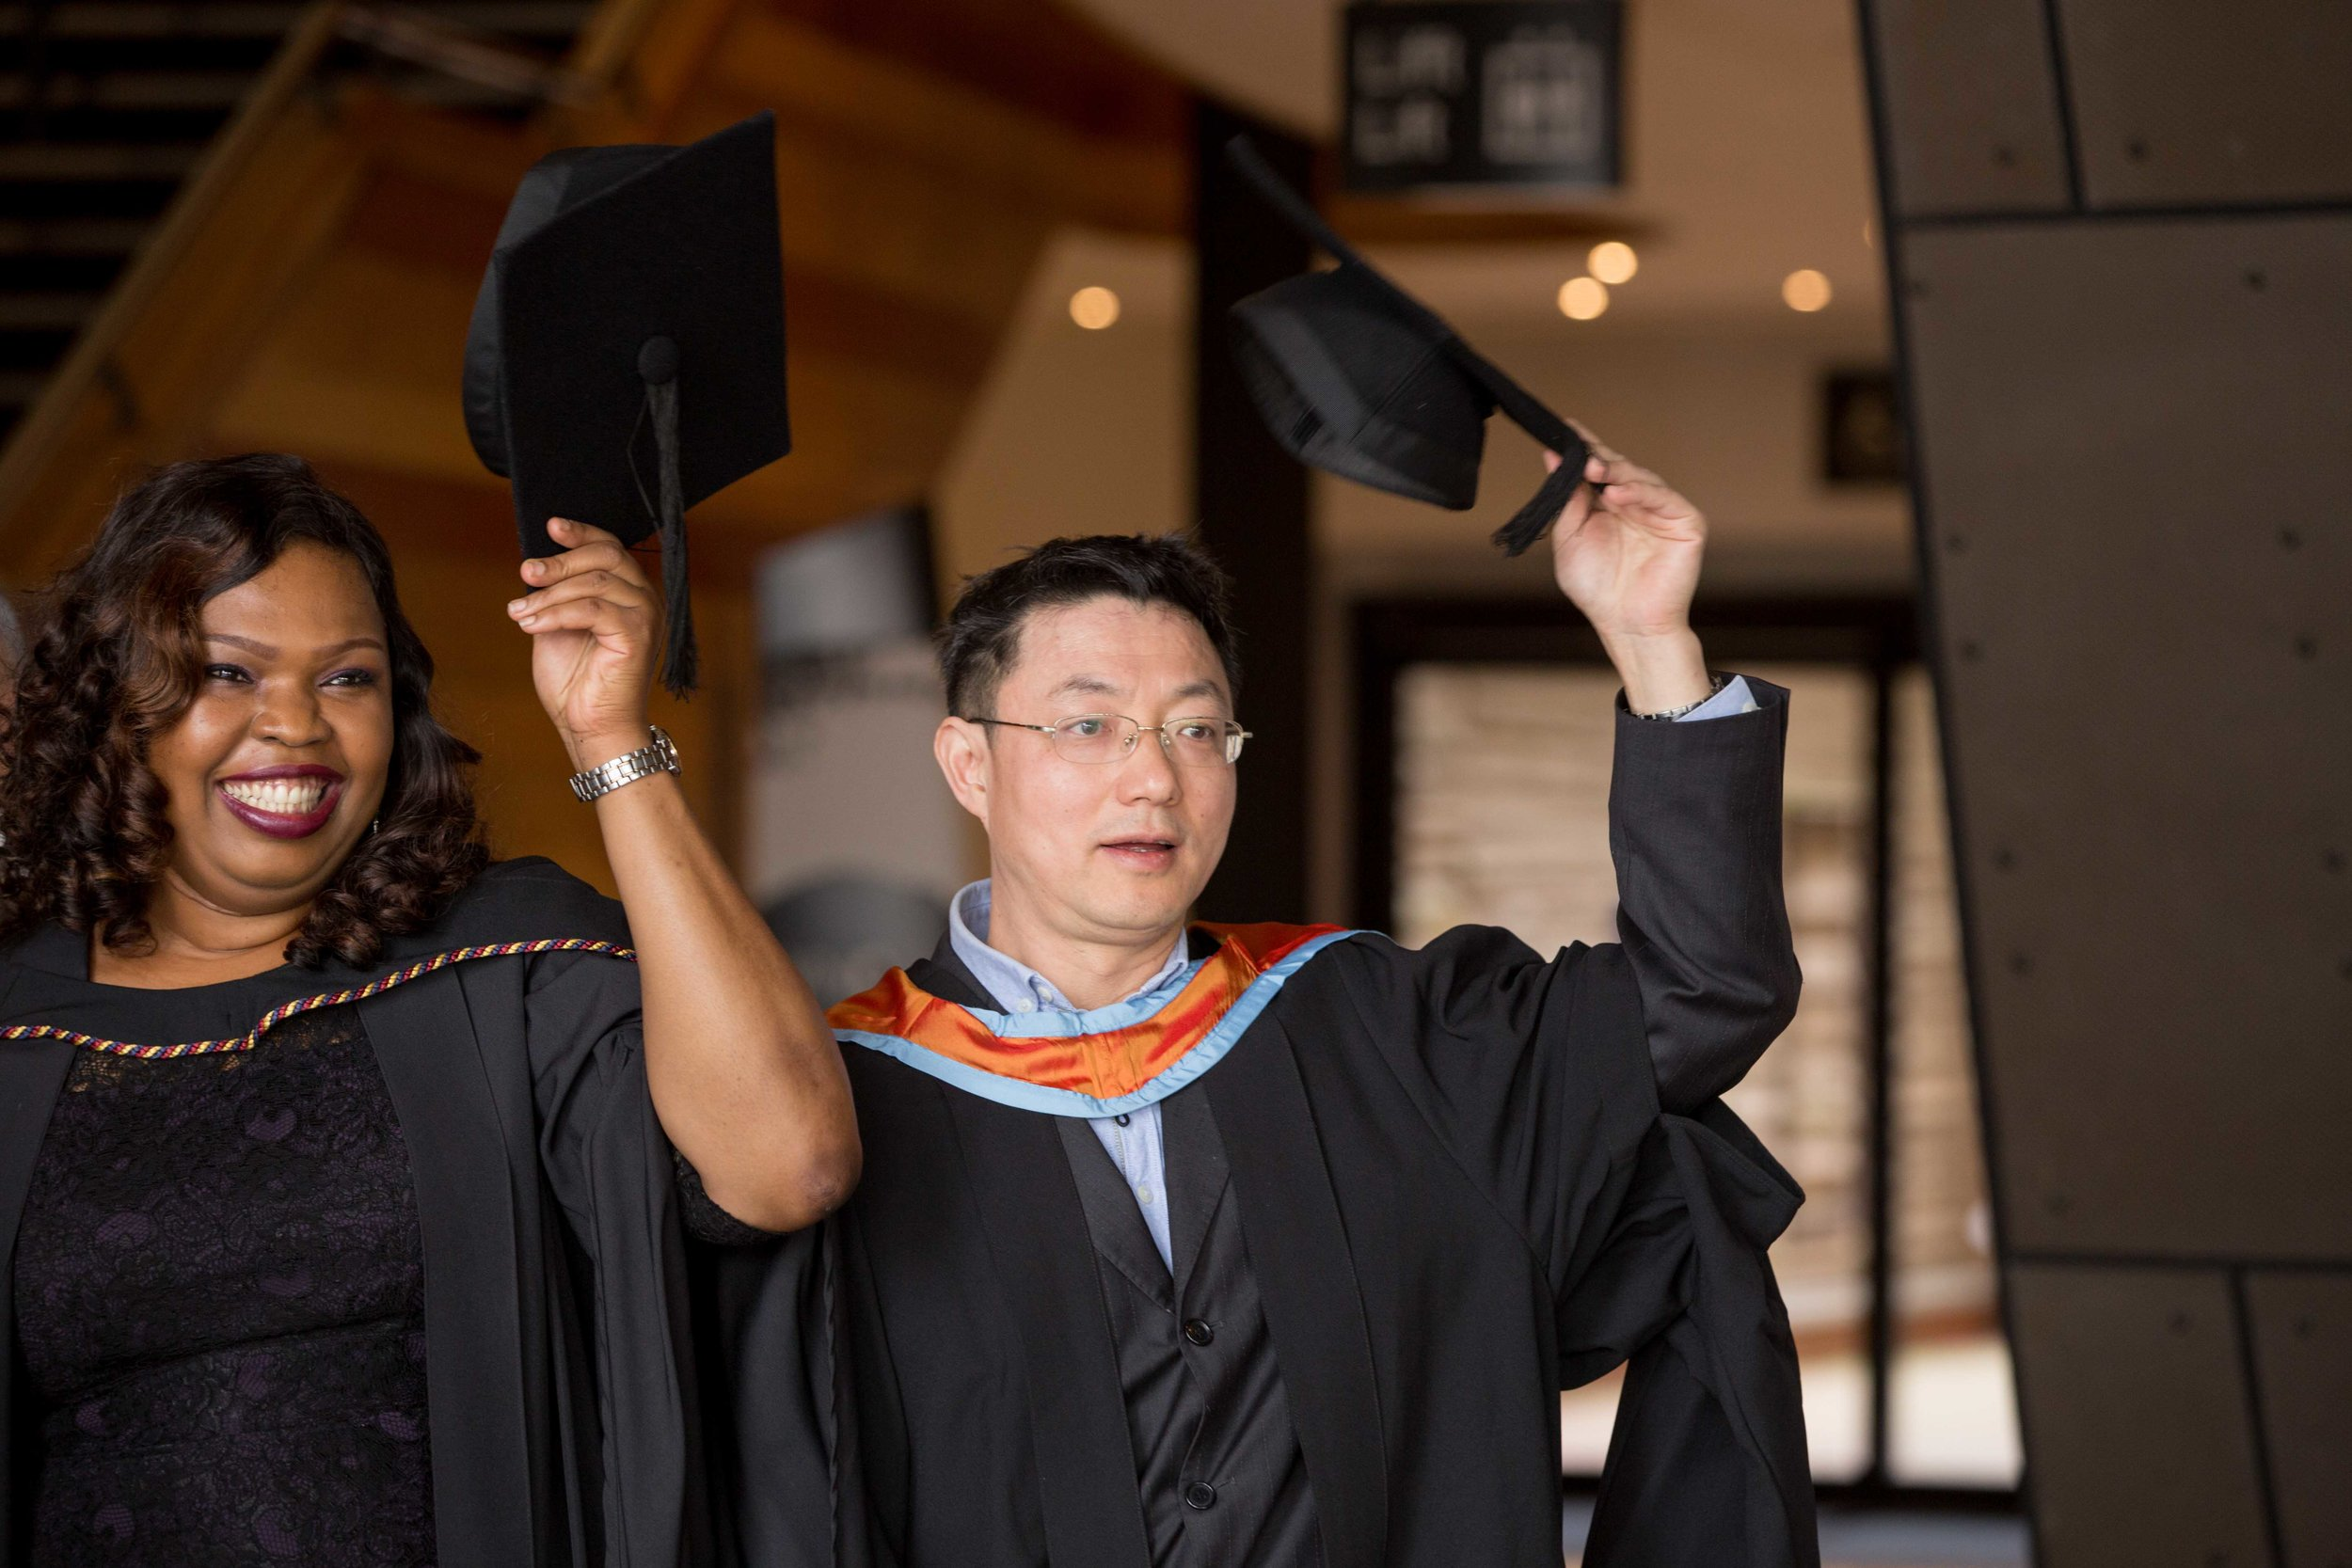 Arden-university-graduation-commercial-photographer-cardiff-natalia-smith-photography-25.jpg